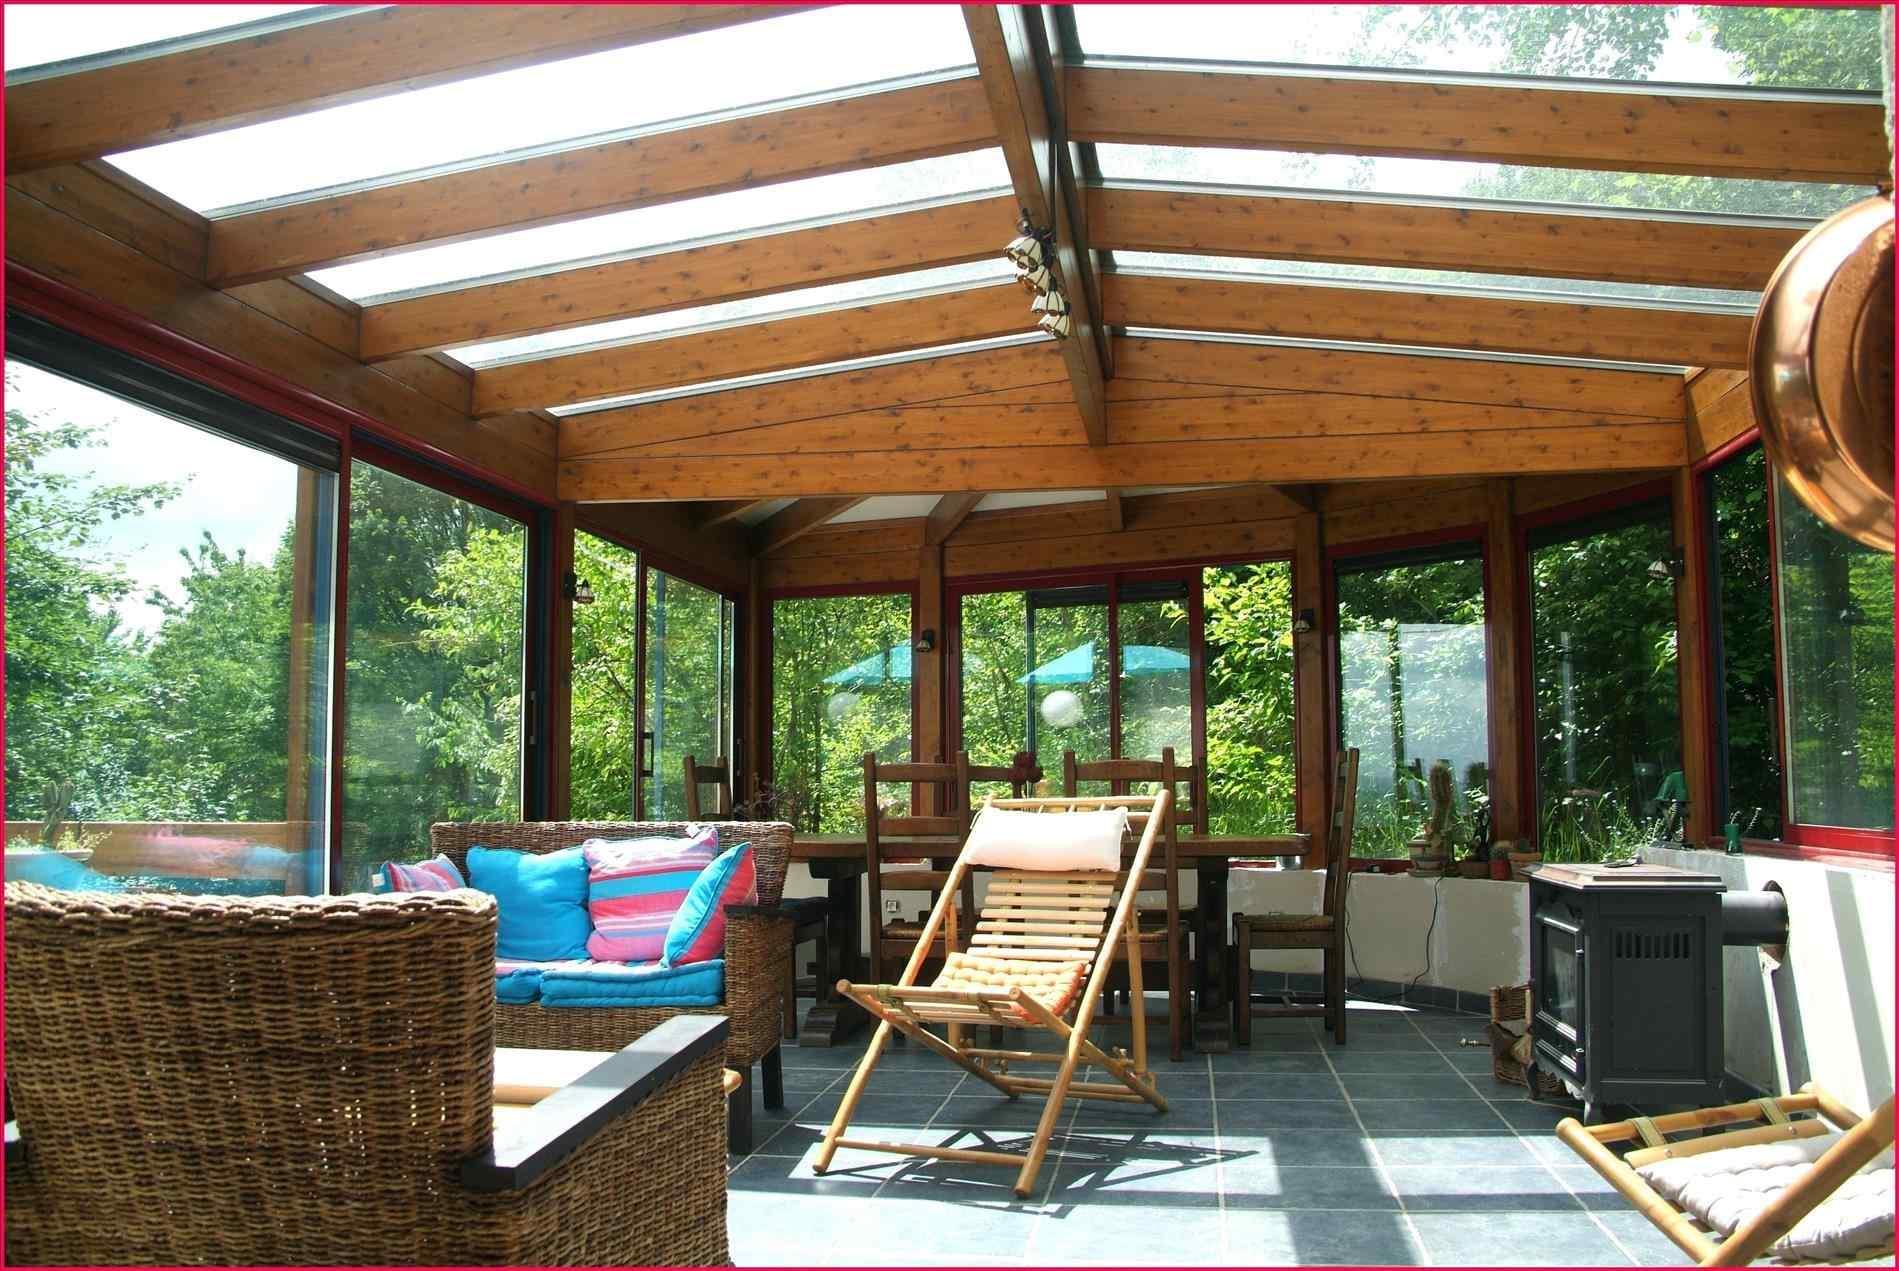 Modele veranda ouverte - veranda-styledevie.fr